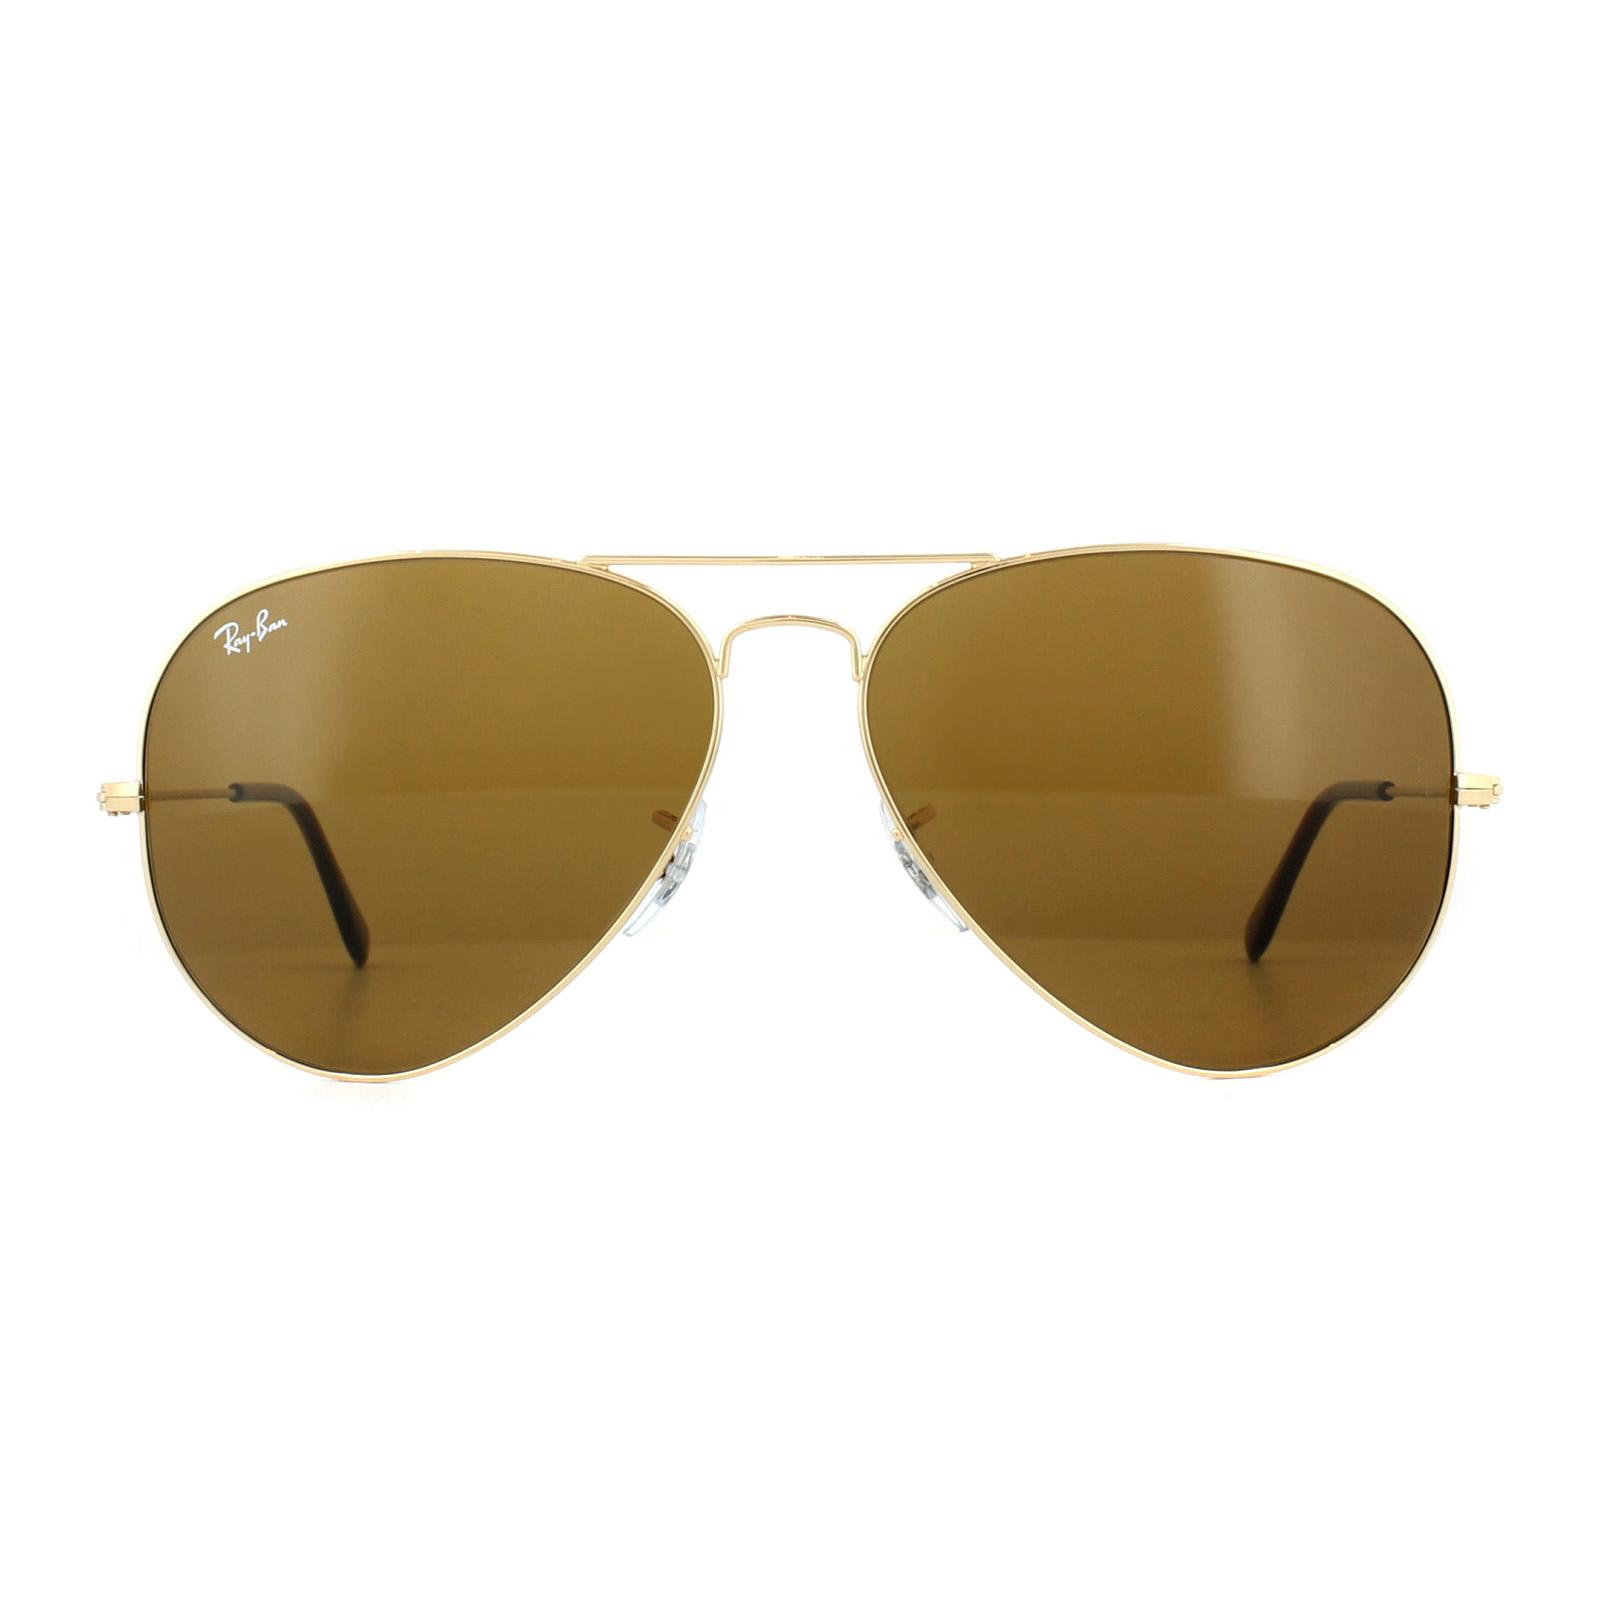 bc74b466a CENTINELA Gafas de sol de Ray-Ban Aviator 3025 001/33 oro marrón 62mm